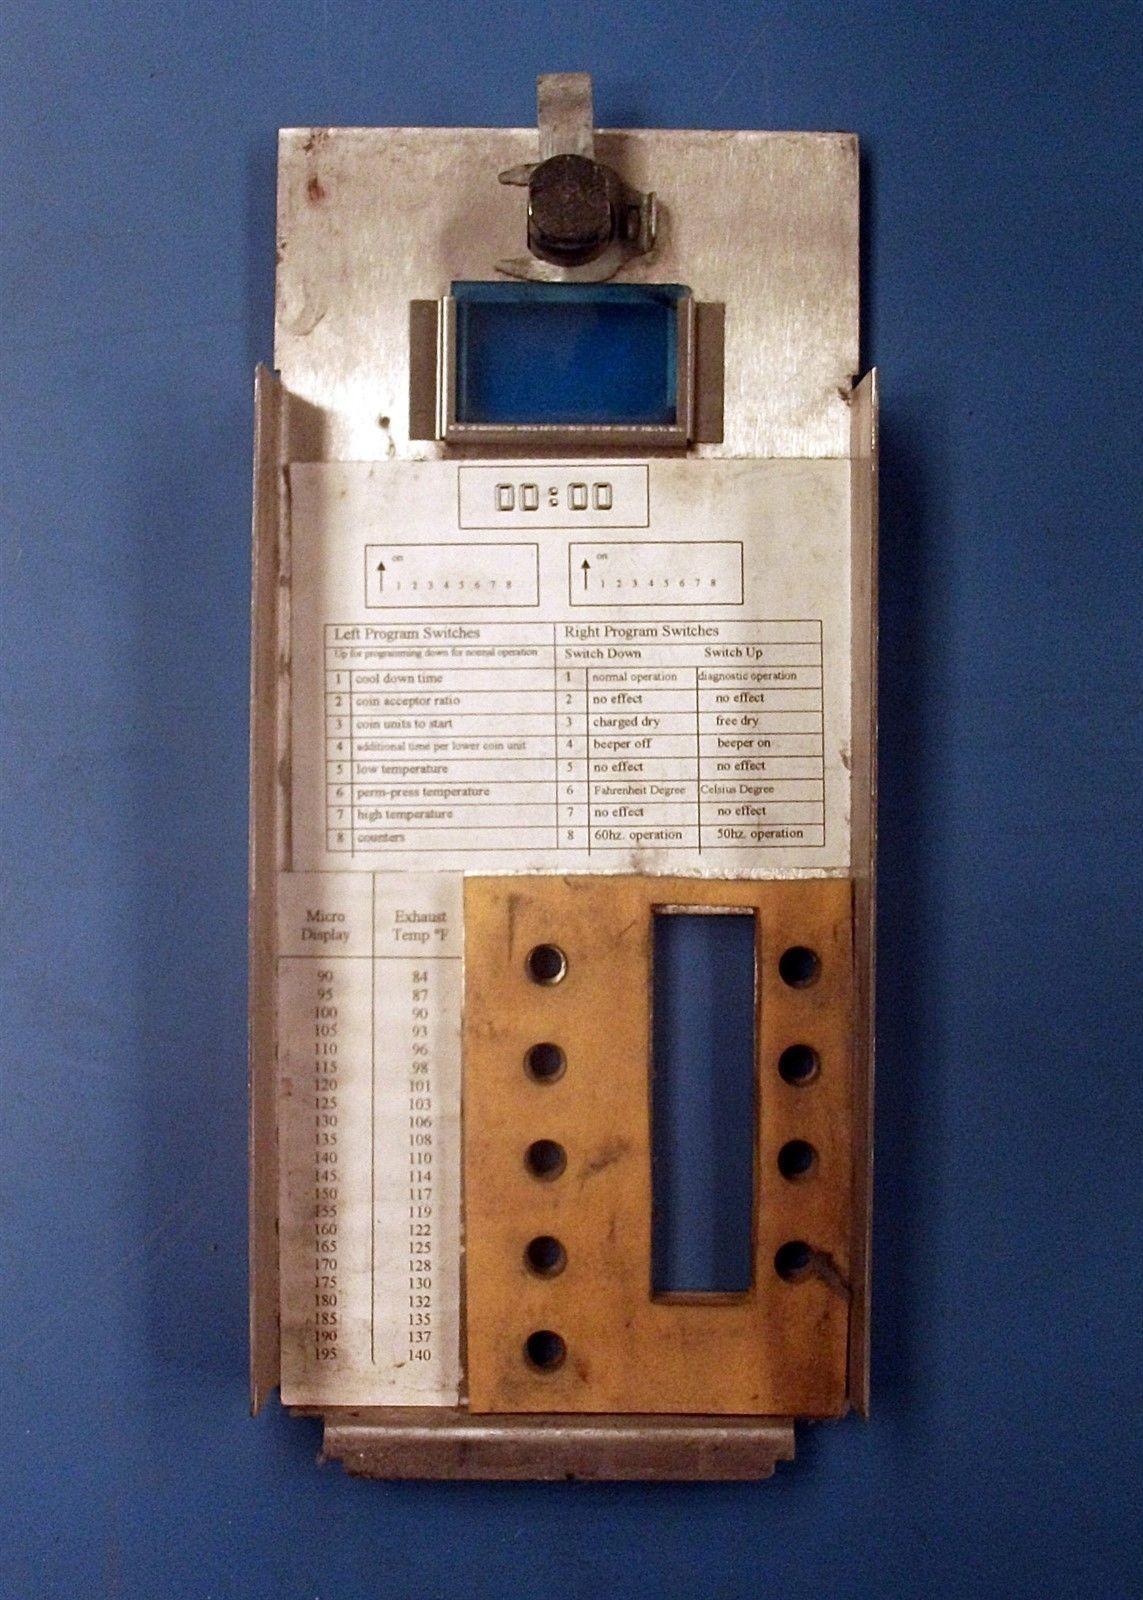 Huebsch Wascomat Speed Queen Upper Dryer Control Faceplate Model std32dg